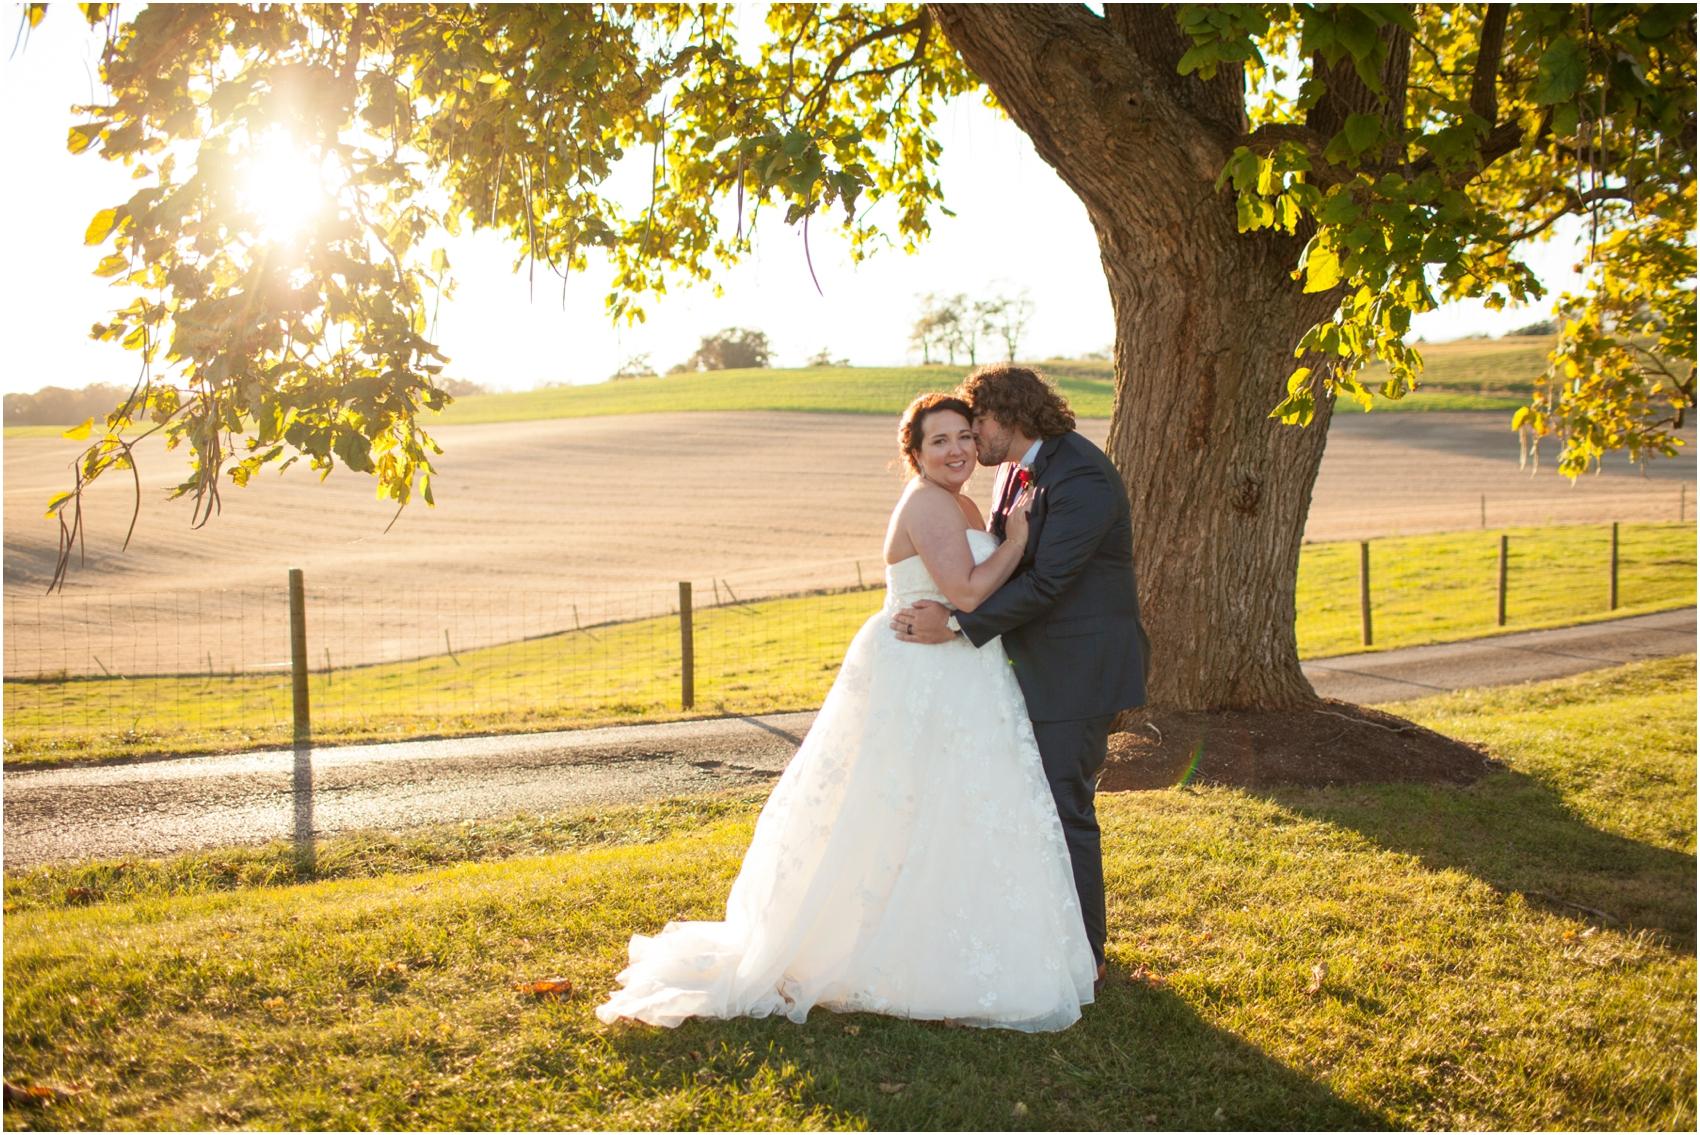 On-Sunny-Slope-Farm-Fall-Virginia-Wedding-3236.jpg